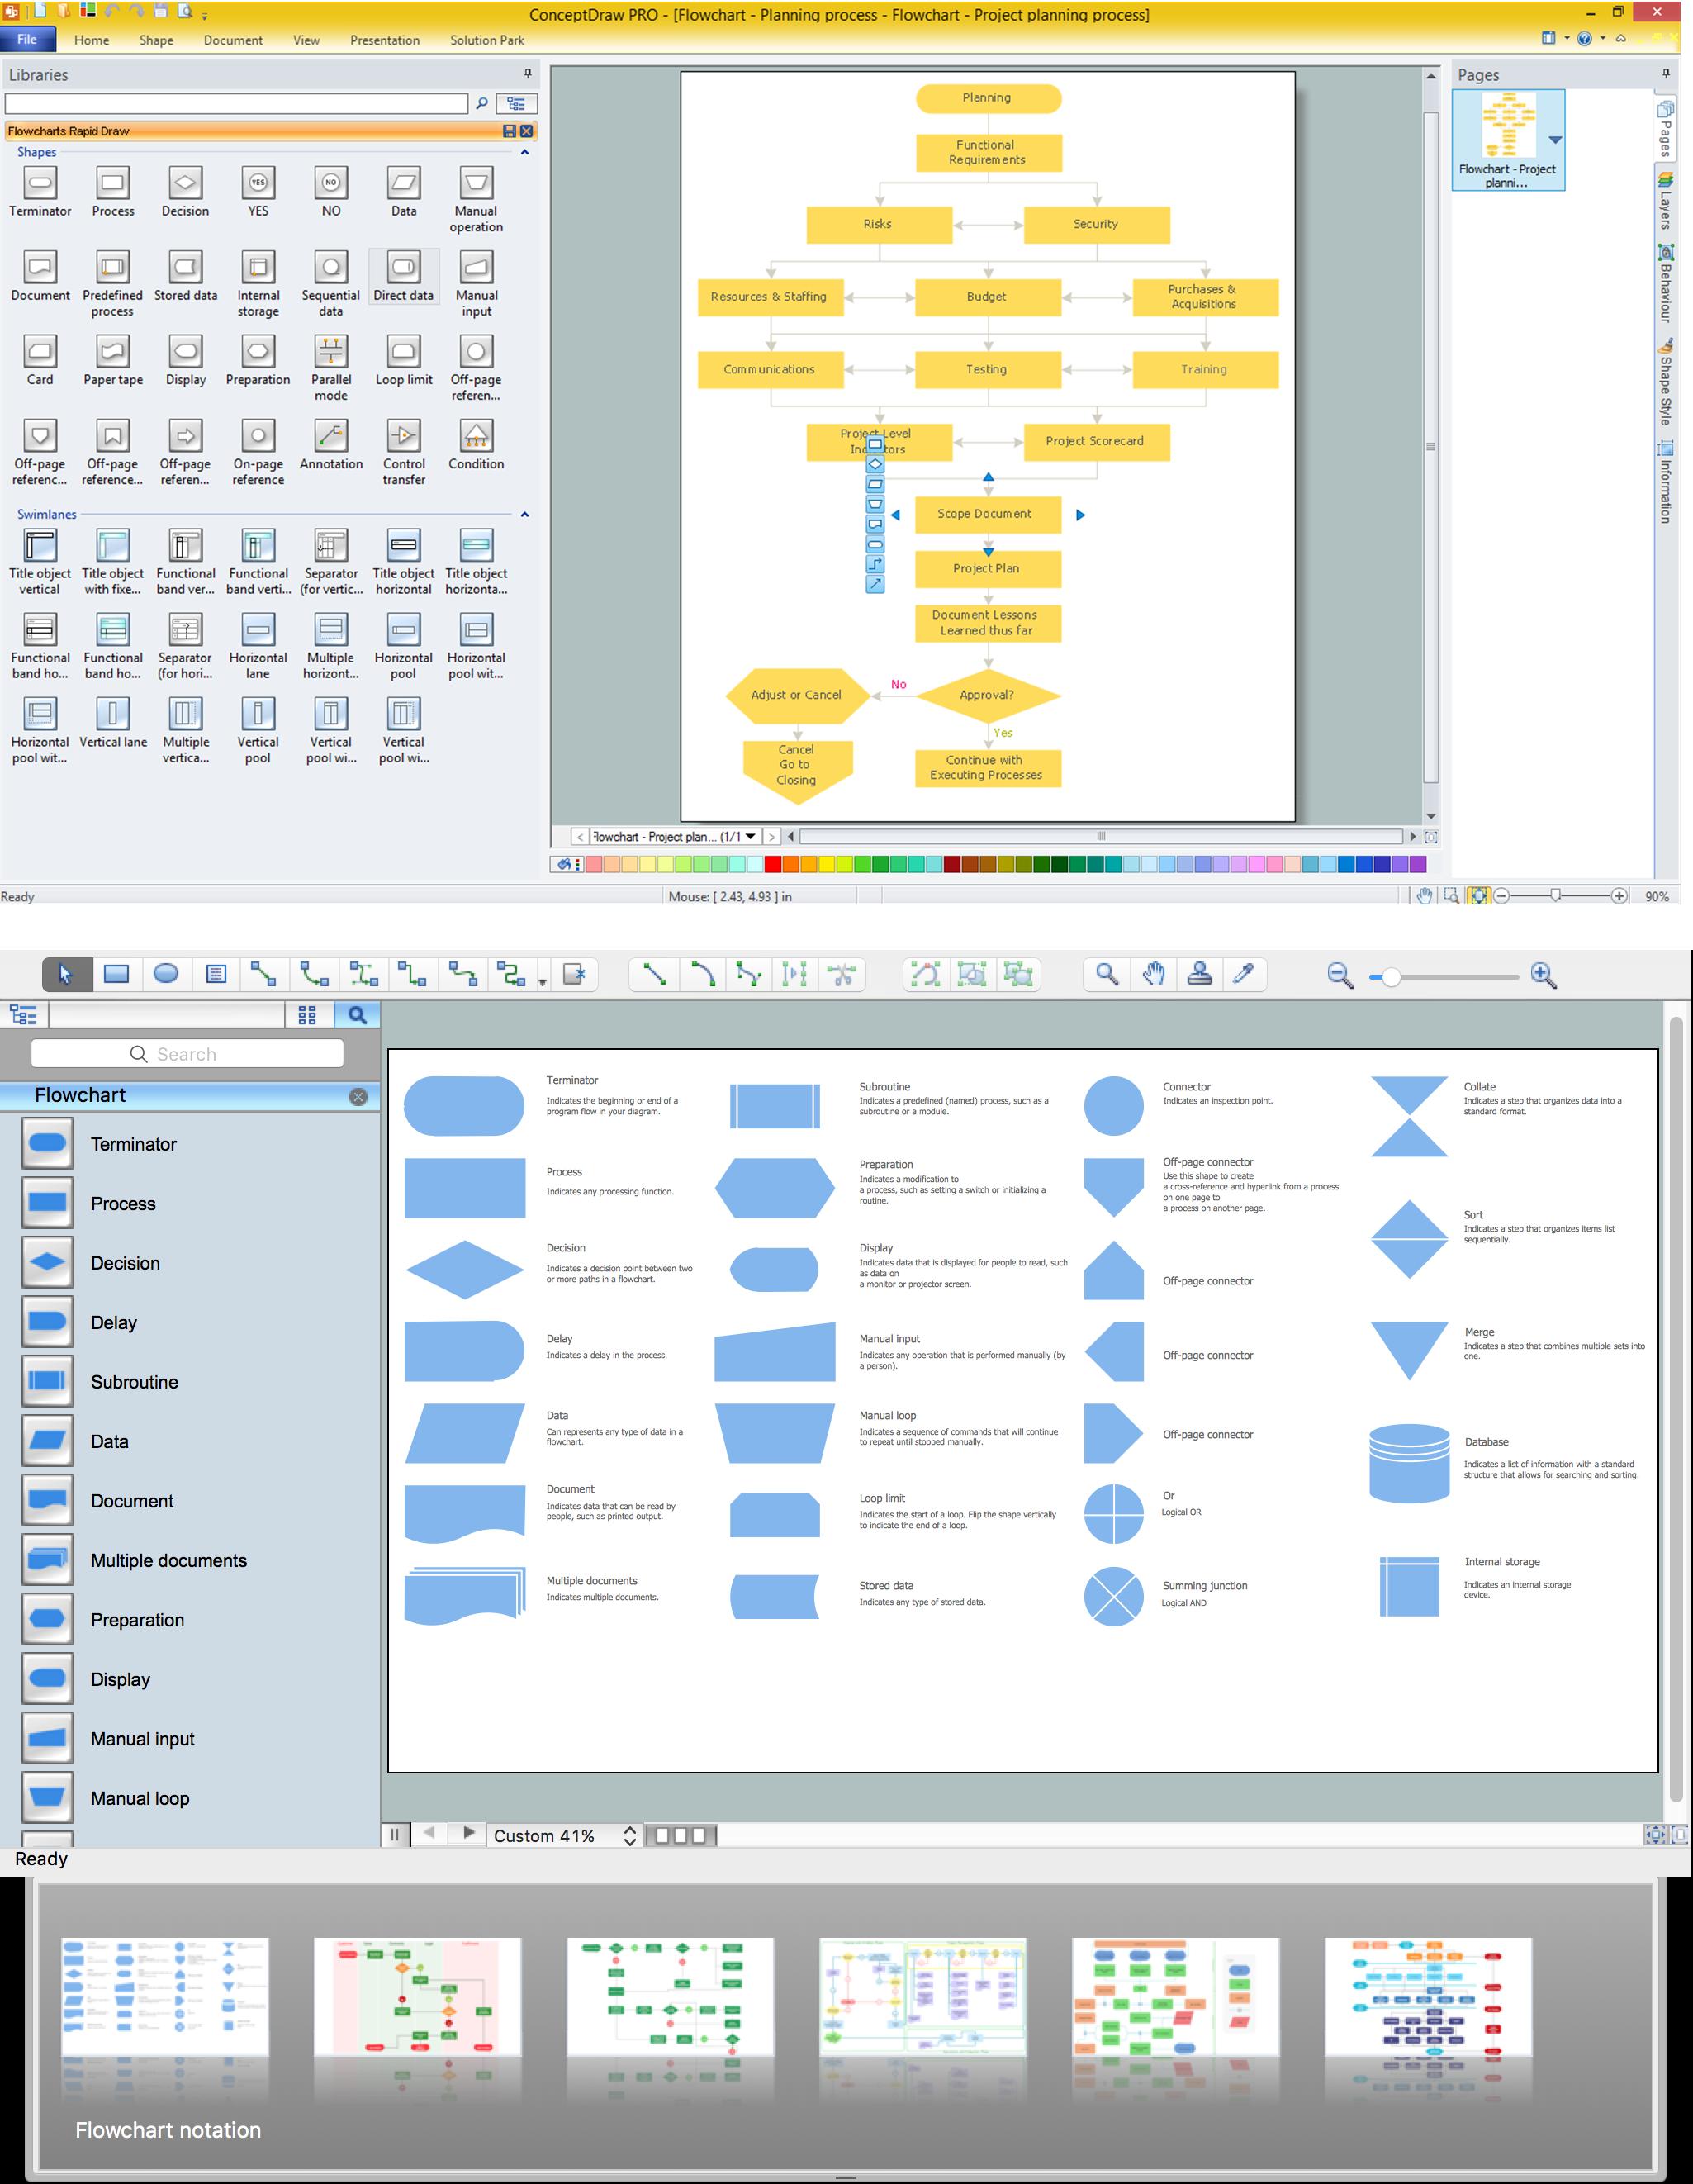 Easy Flowchart Program, flowchart symbols, process flow diagram, this is flowchart maker